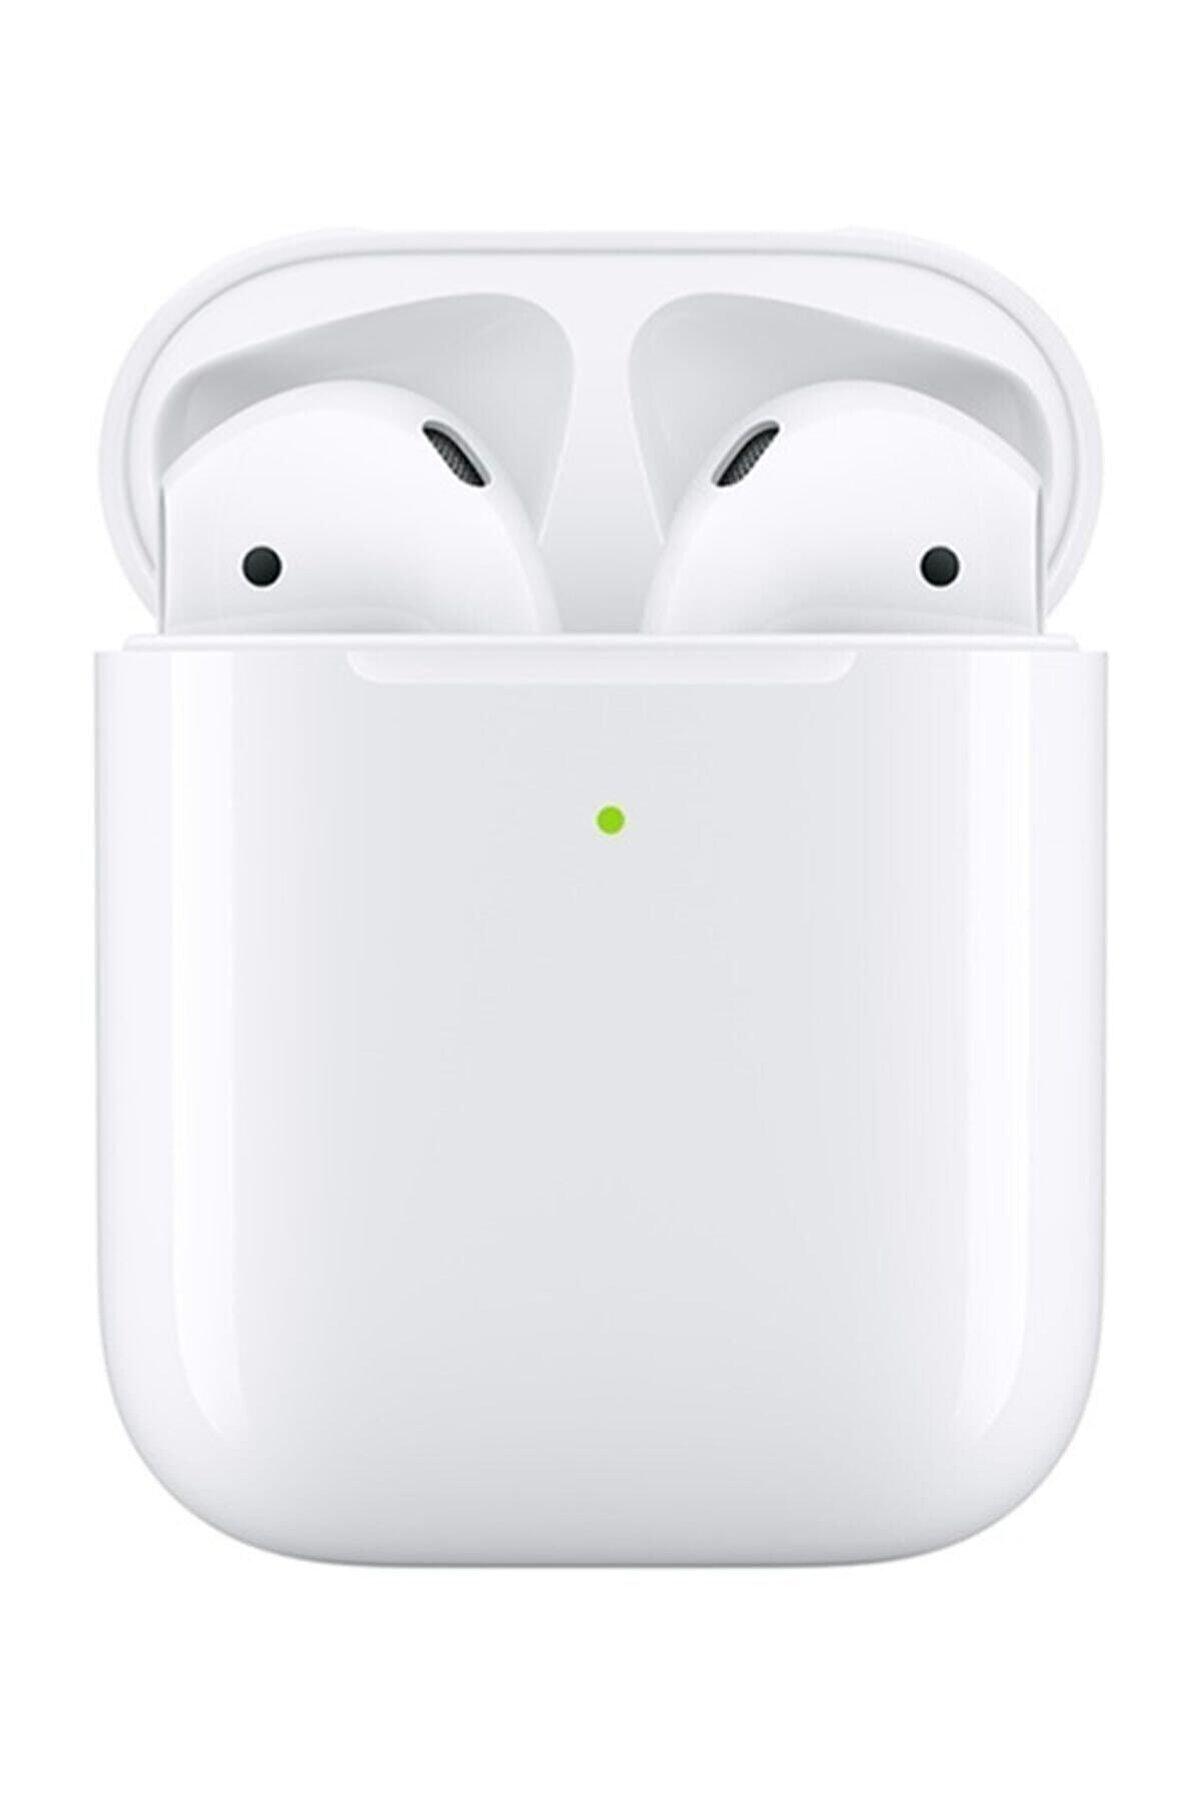 thedavy&Jones Airpods 2.nesil Ios Ve Android Uyumlu Bluetooth Kulaklık